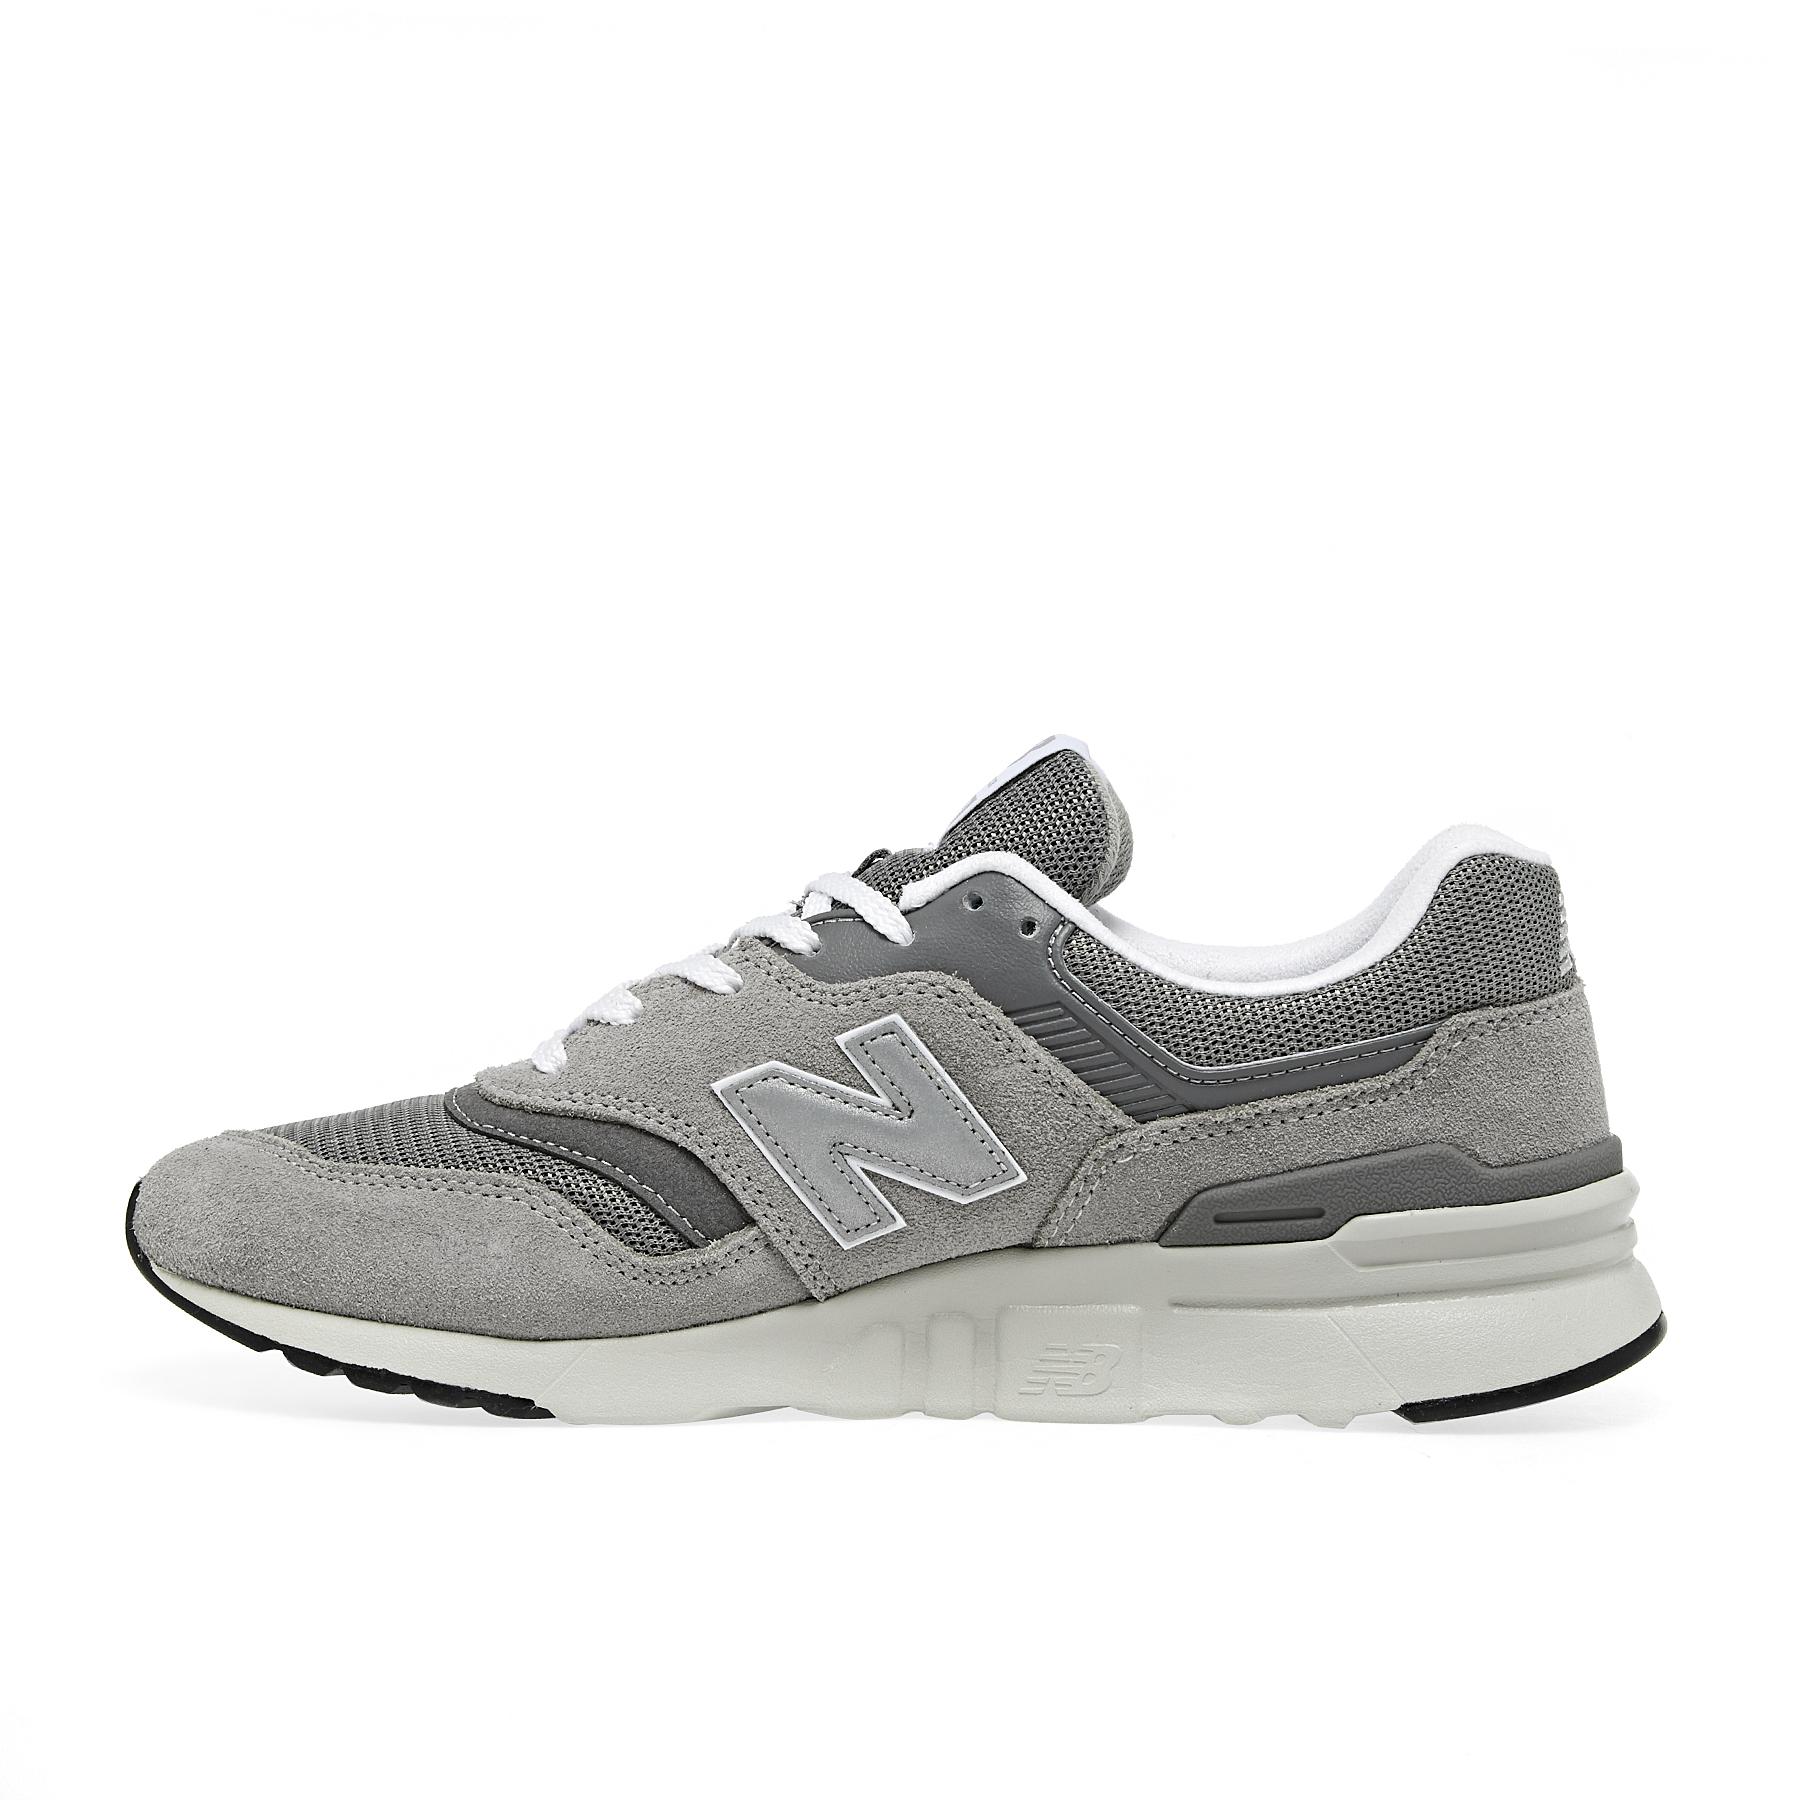 new balance cm997 grey